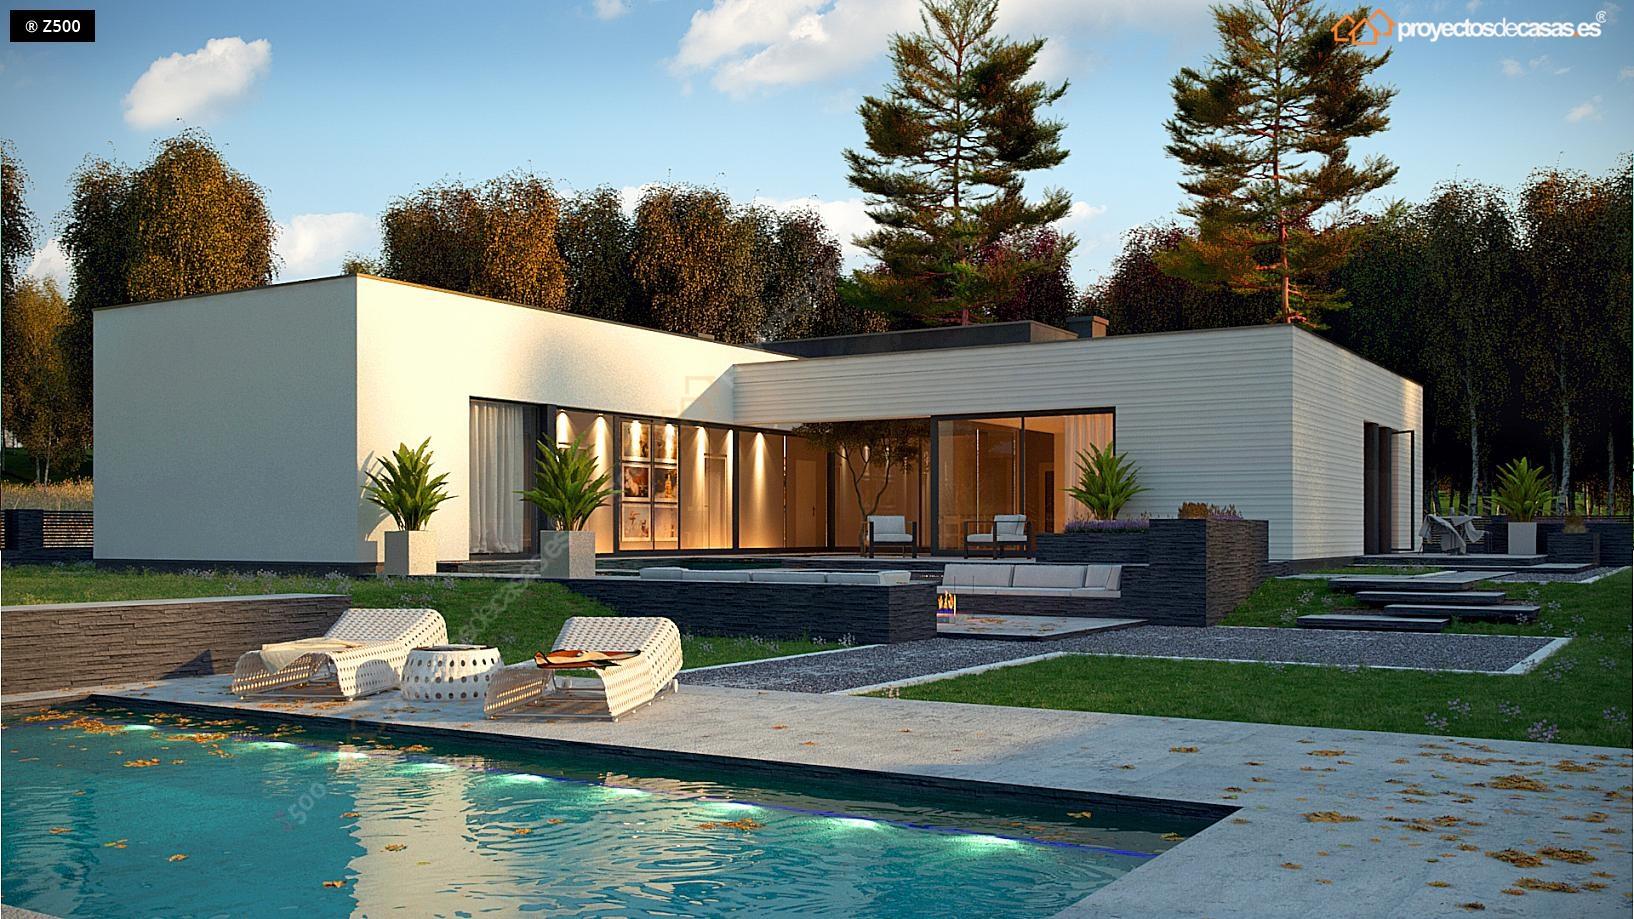 Proyectos de casas casa moderna de 1 planta con piscina for Planos de casas para construir de una planta